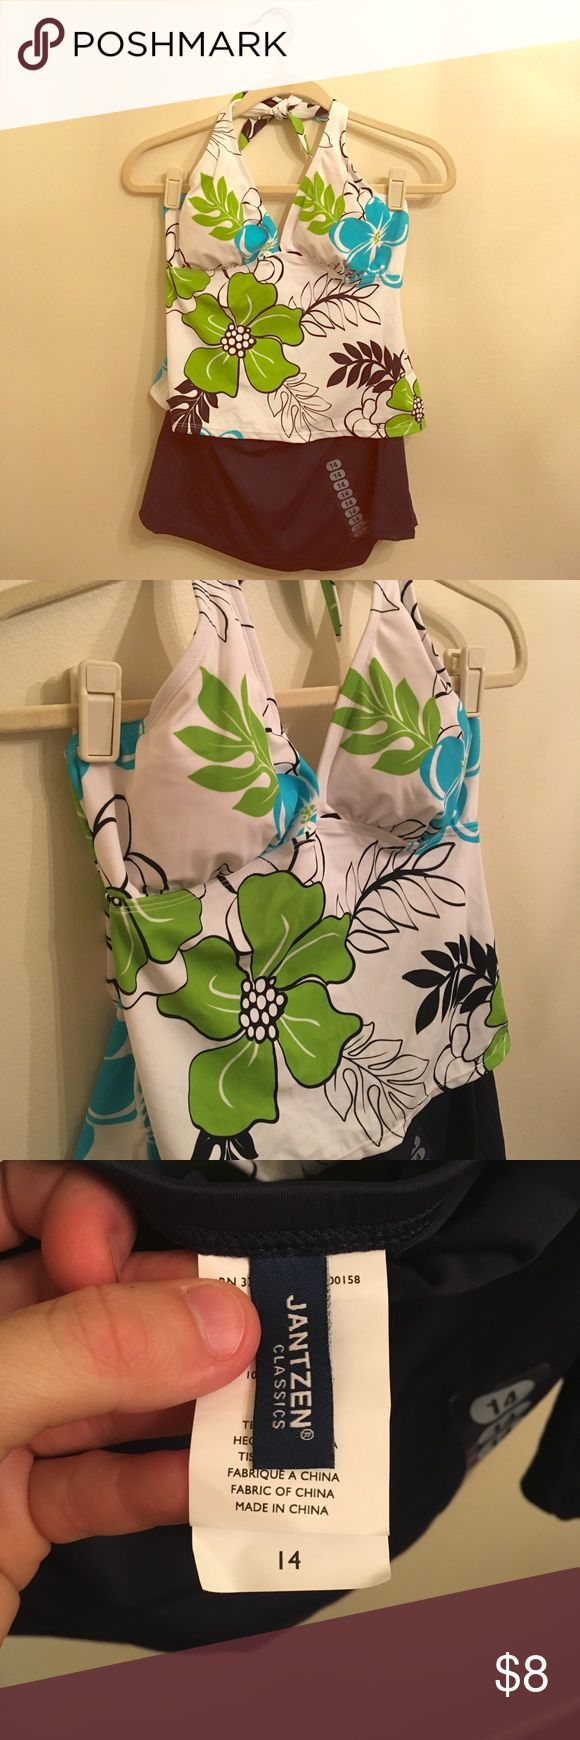 🦋$8🦋 💥NEW💥 2 Piece Tankini Bathing Suit Price firm unless bundled.  Reasonable bundle offers welcome. Swim Bikinis